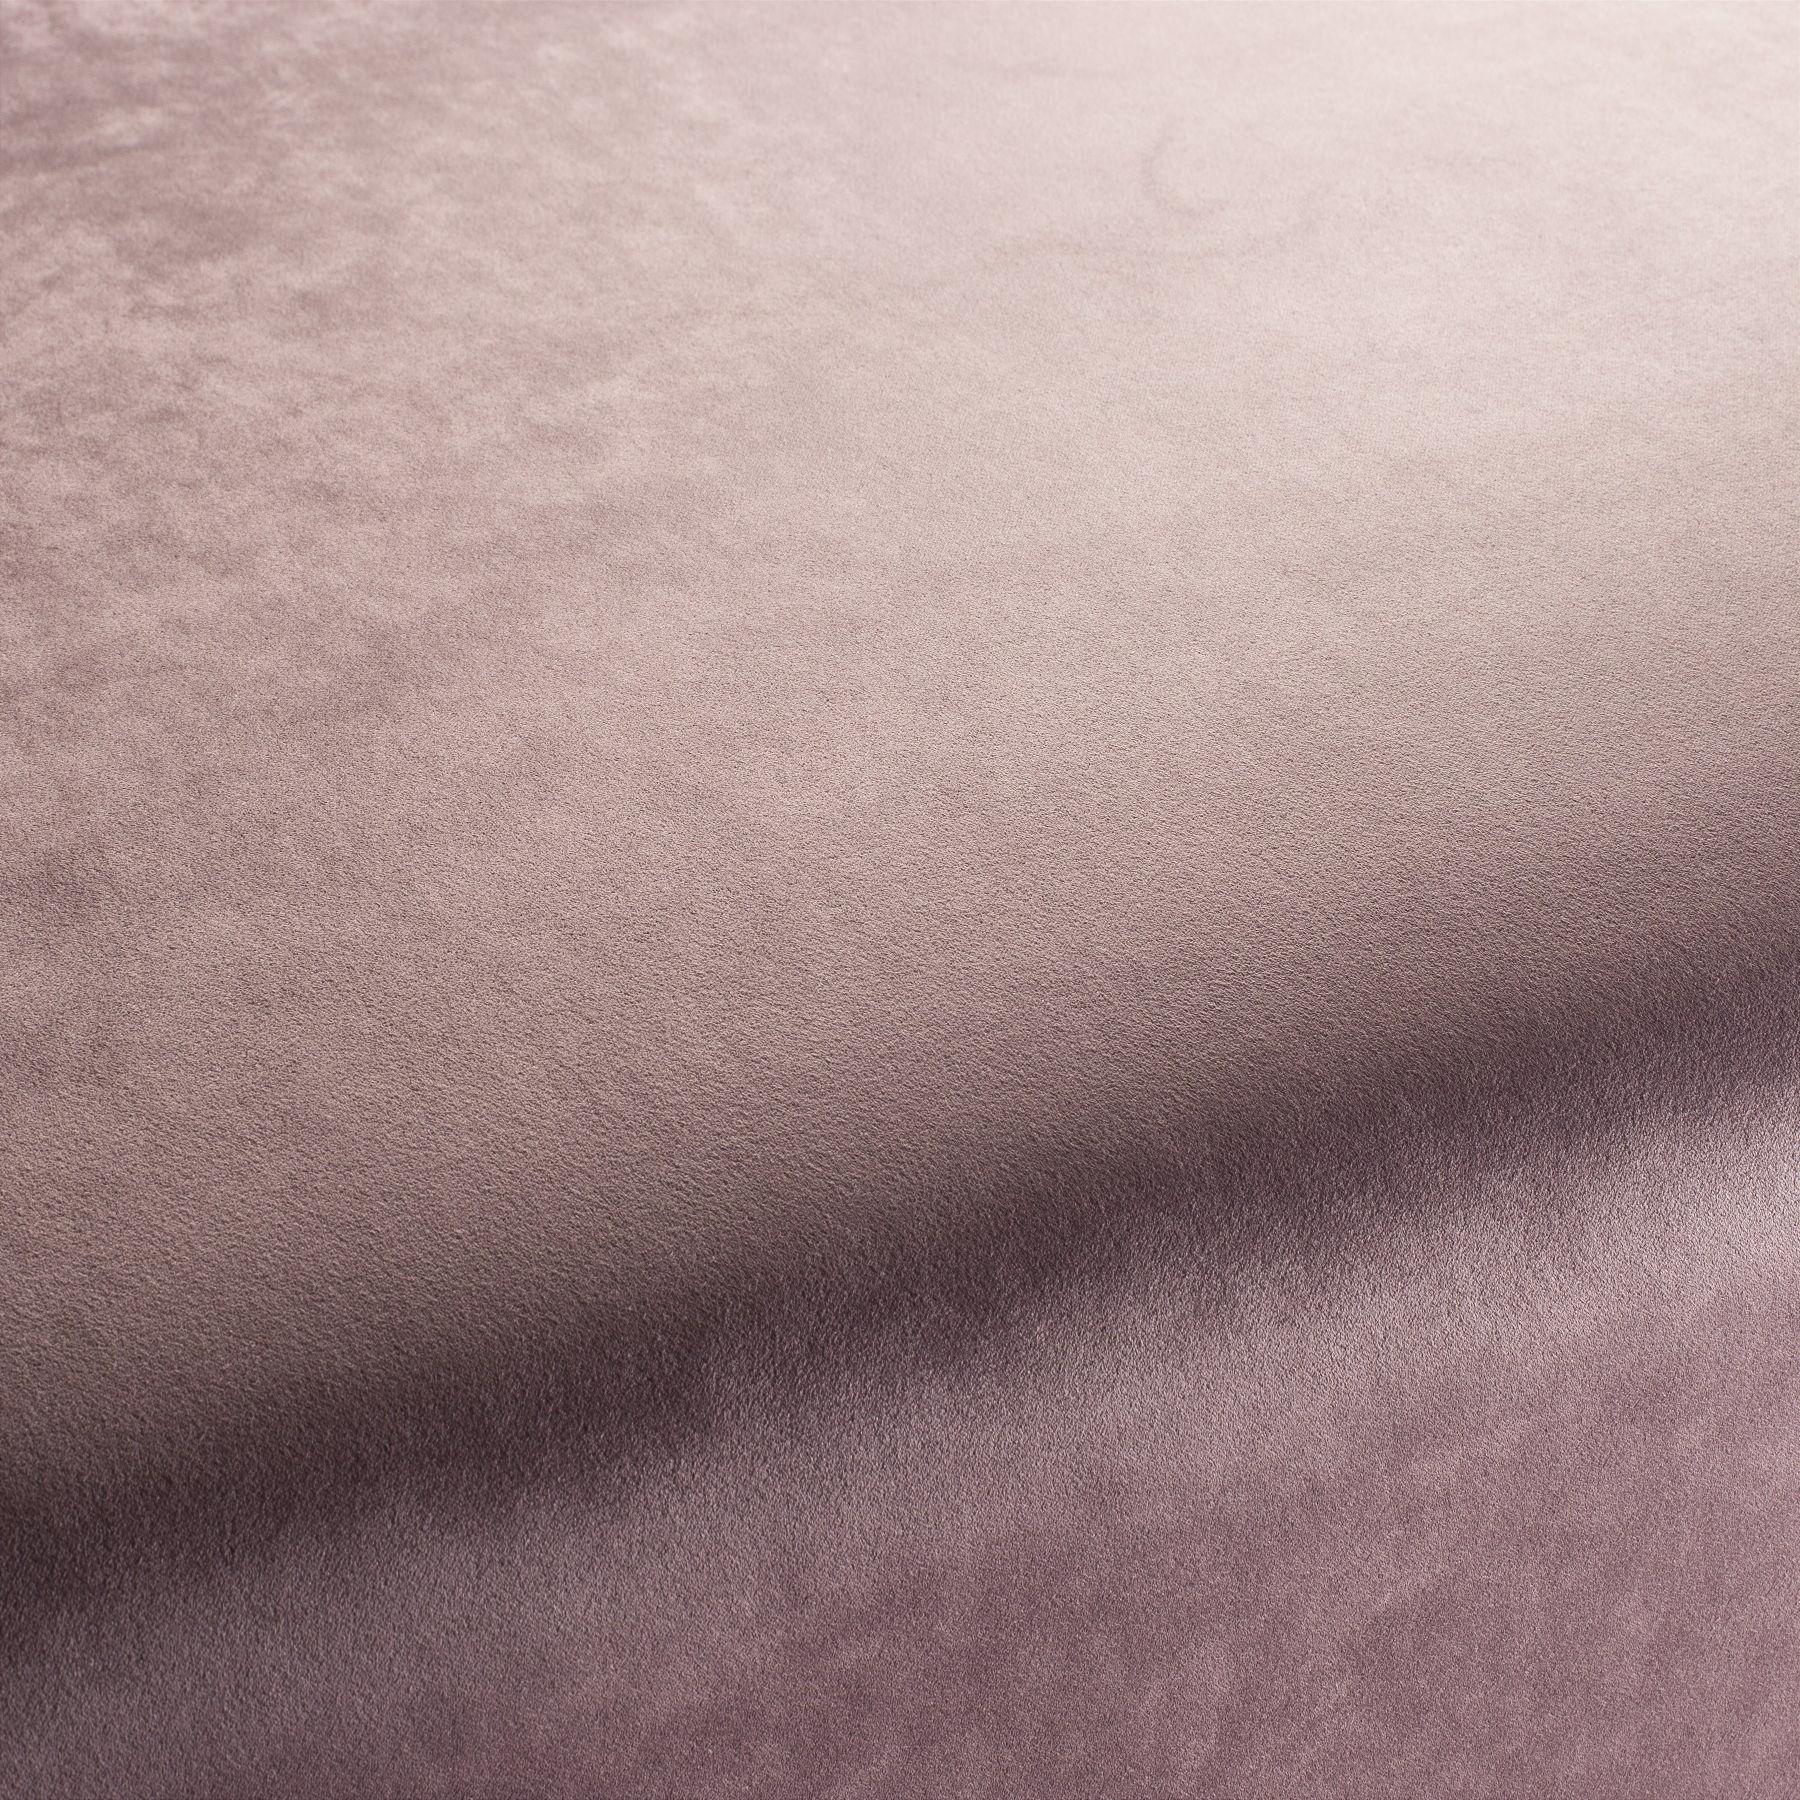 upholstery fabric style 1 3107 080 jab anstoetz fabrics. Black Bedroom Furniture Sets. Home Design Ideas